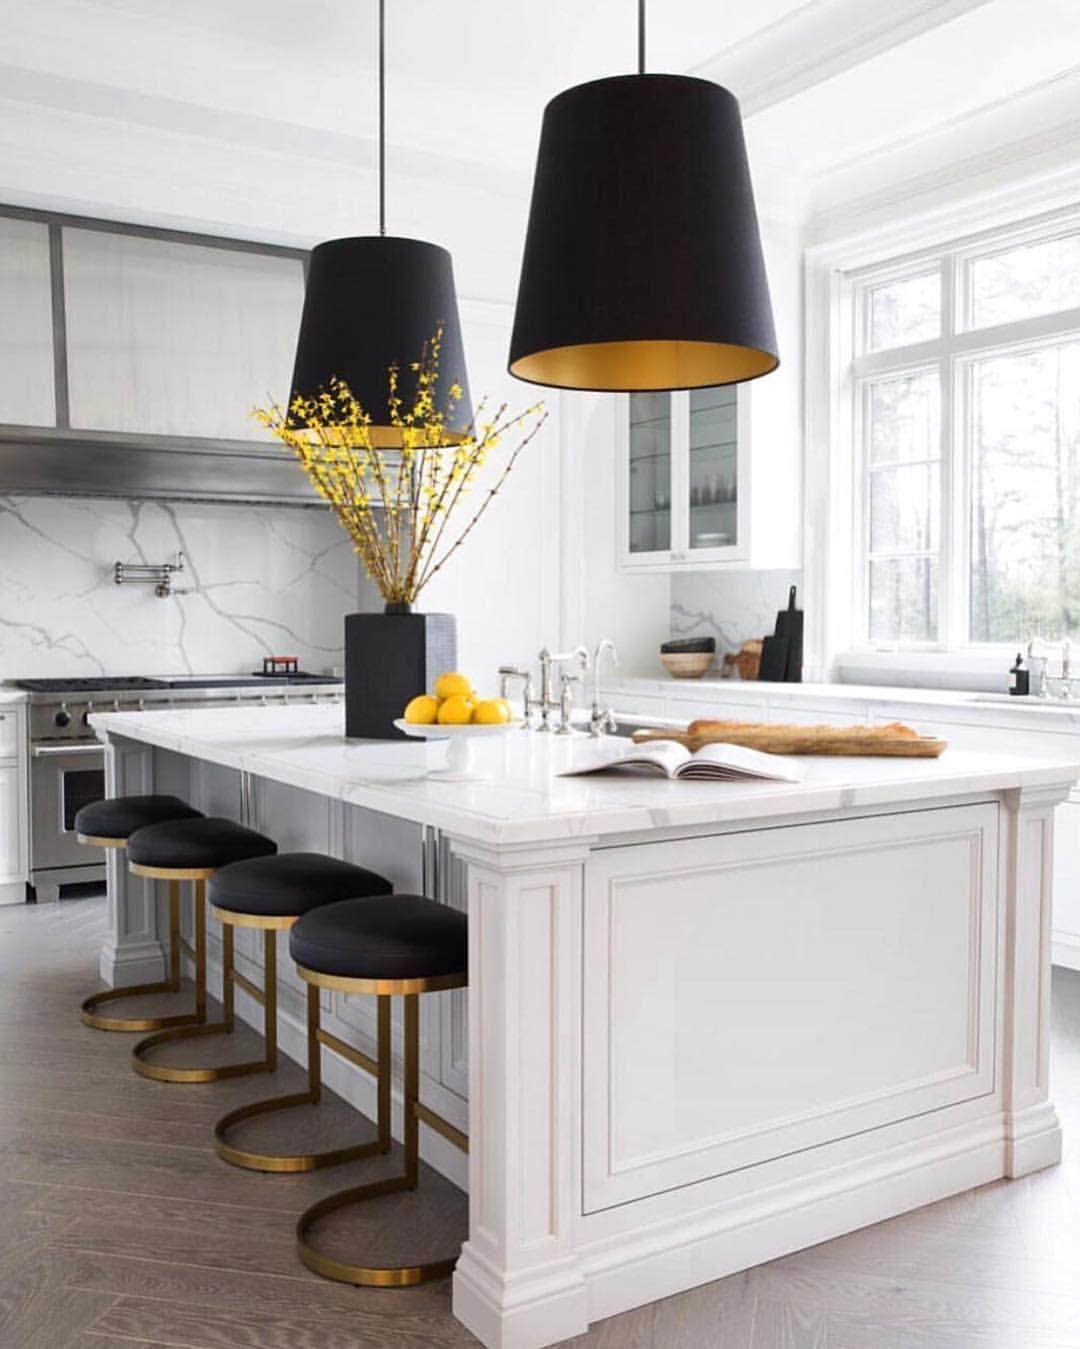 Oversized Pendants Over A Kitchen Island Are Always A Good Idea